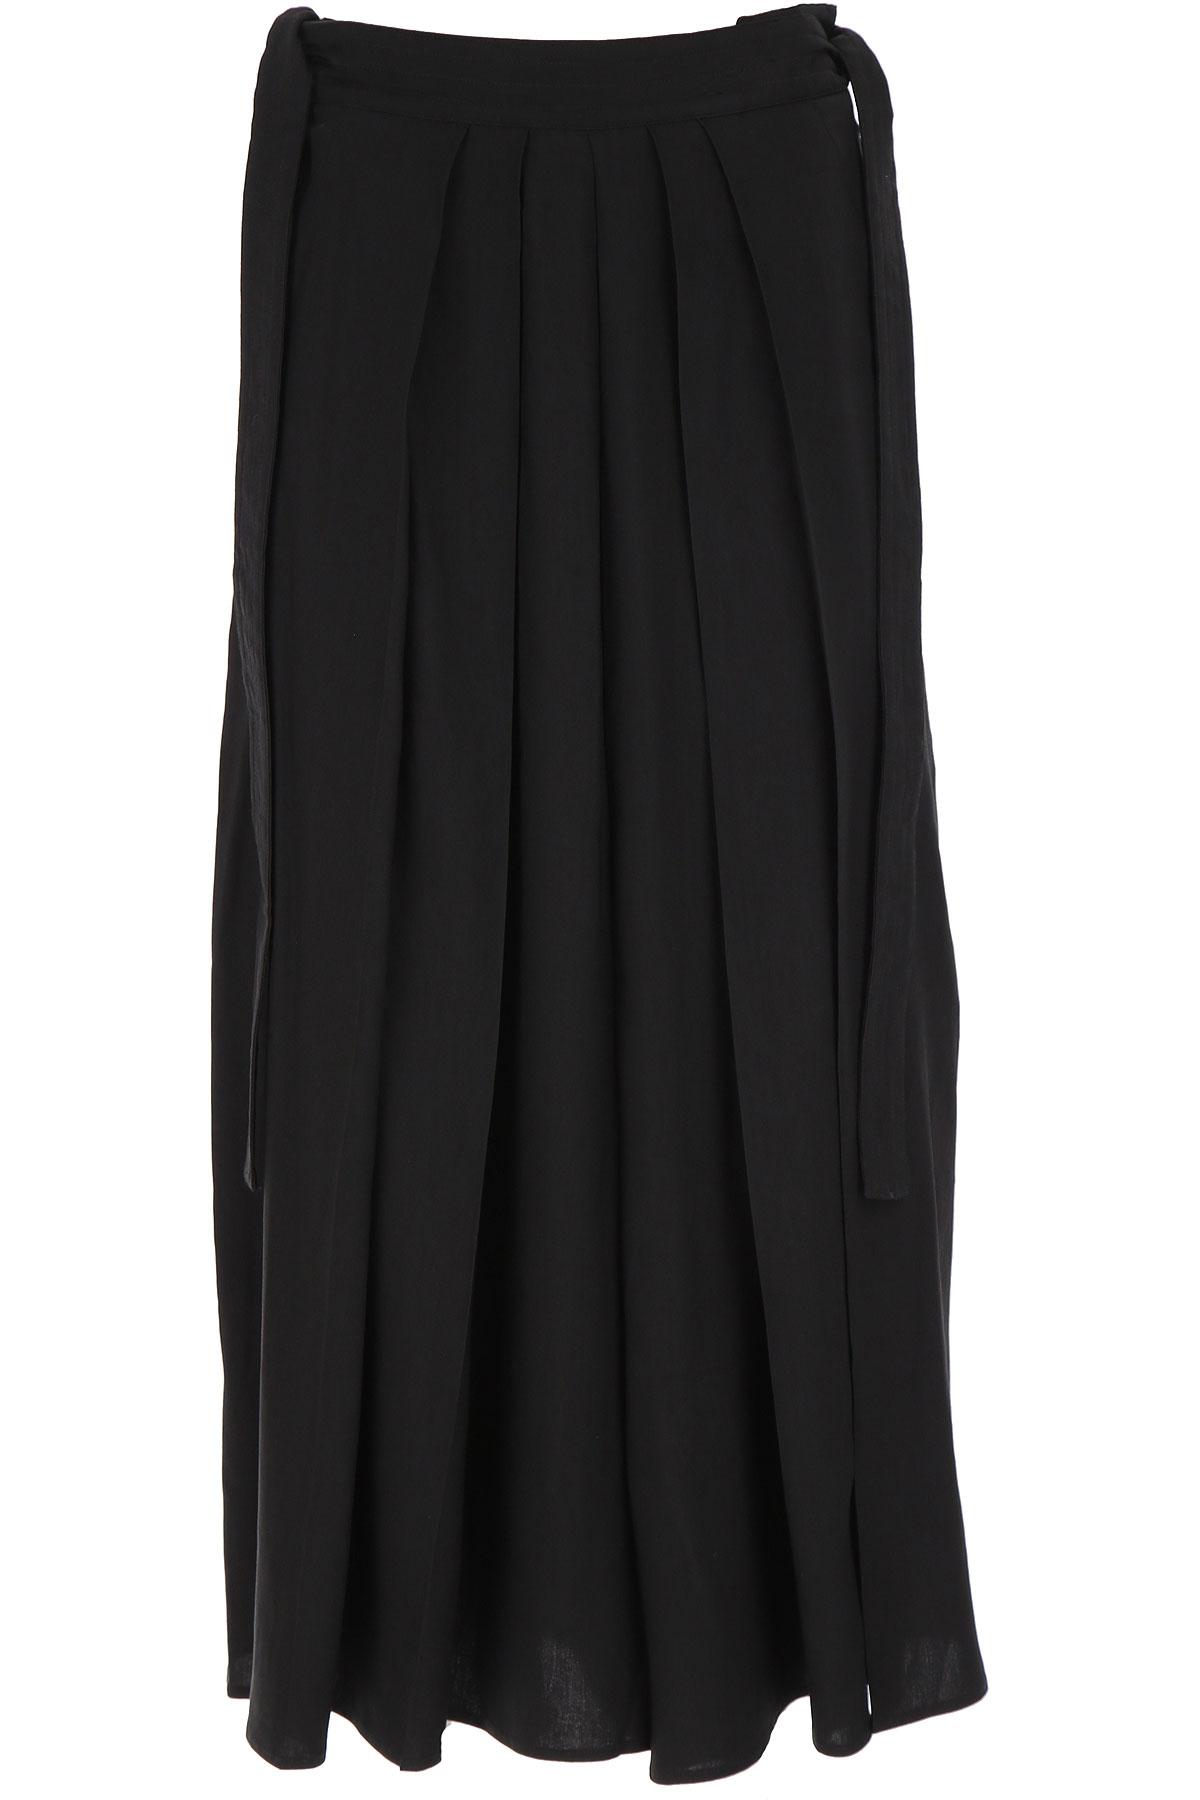 Alexander McQueen McQ Pants for Women On Sale, Black, linen, 2019, 26 28 30